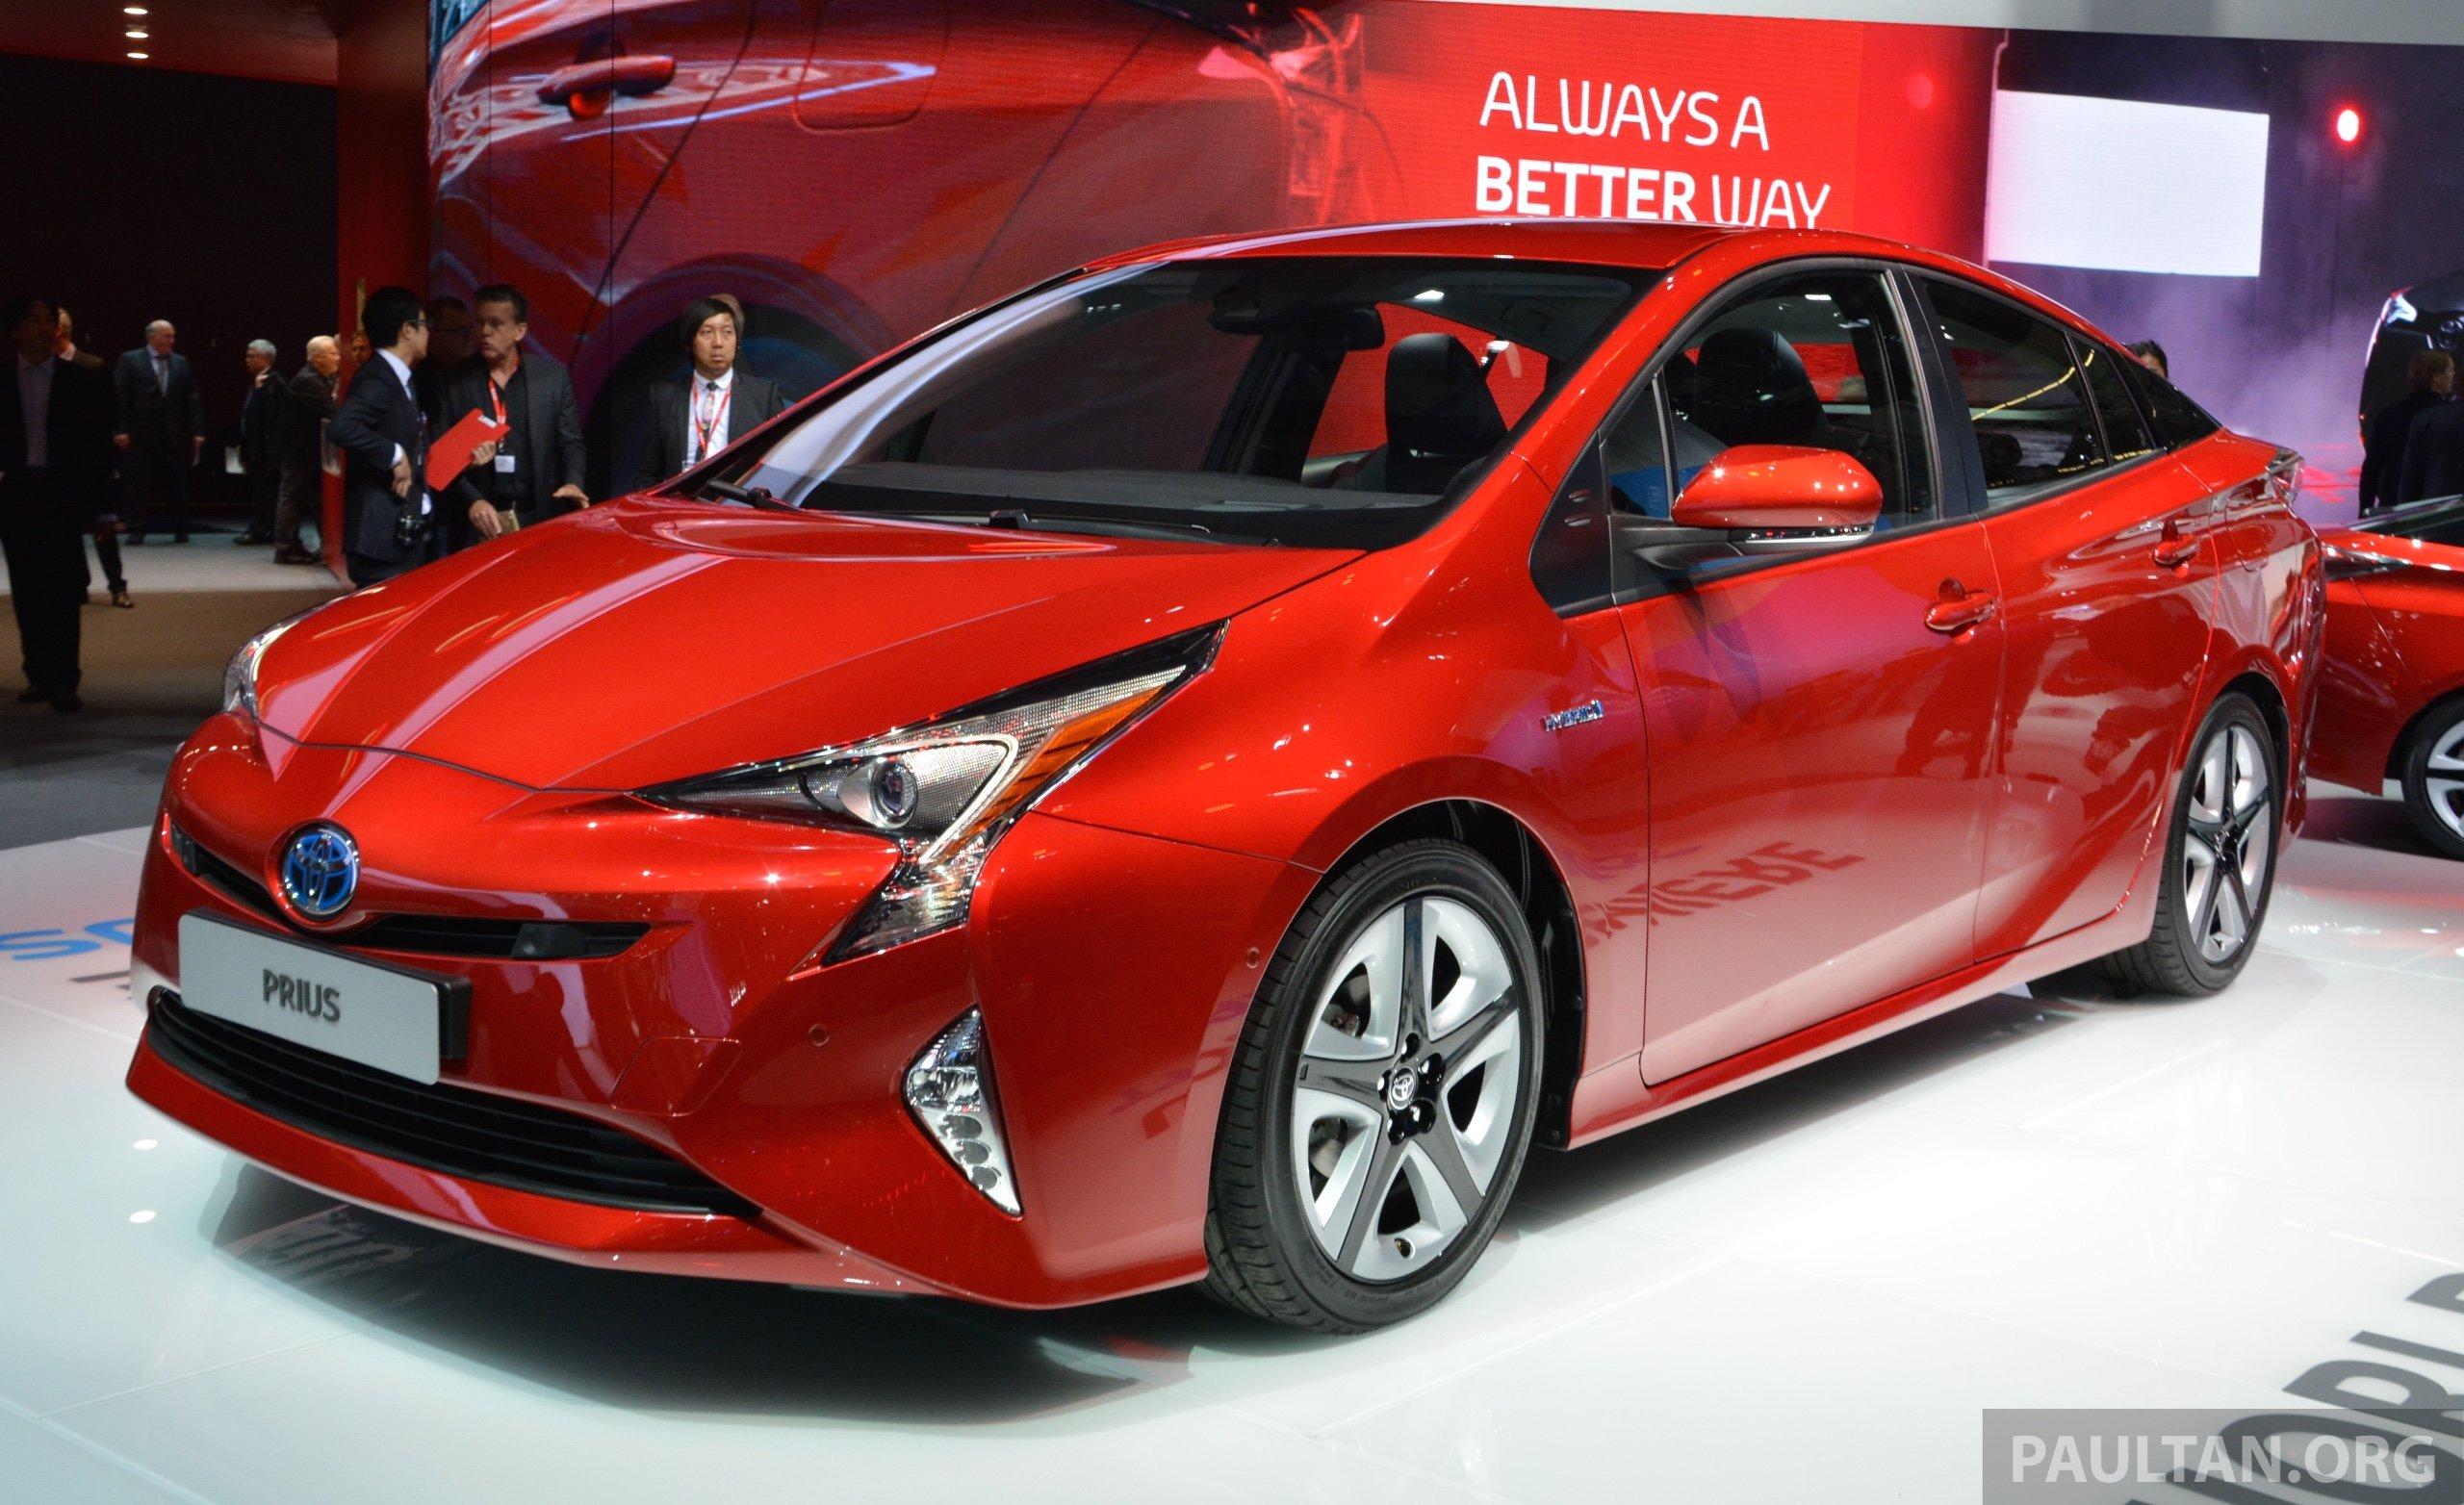 Toyota-Prius-4th-gen-Frankfurt-1.jpg